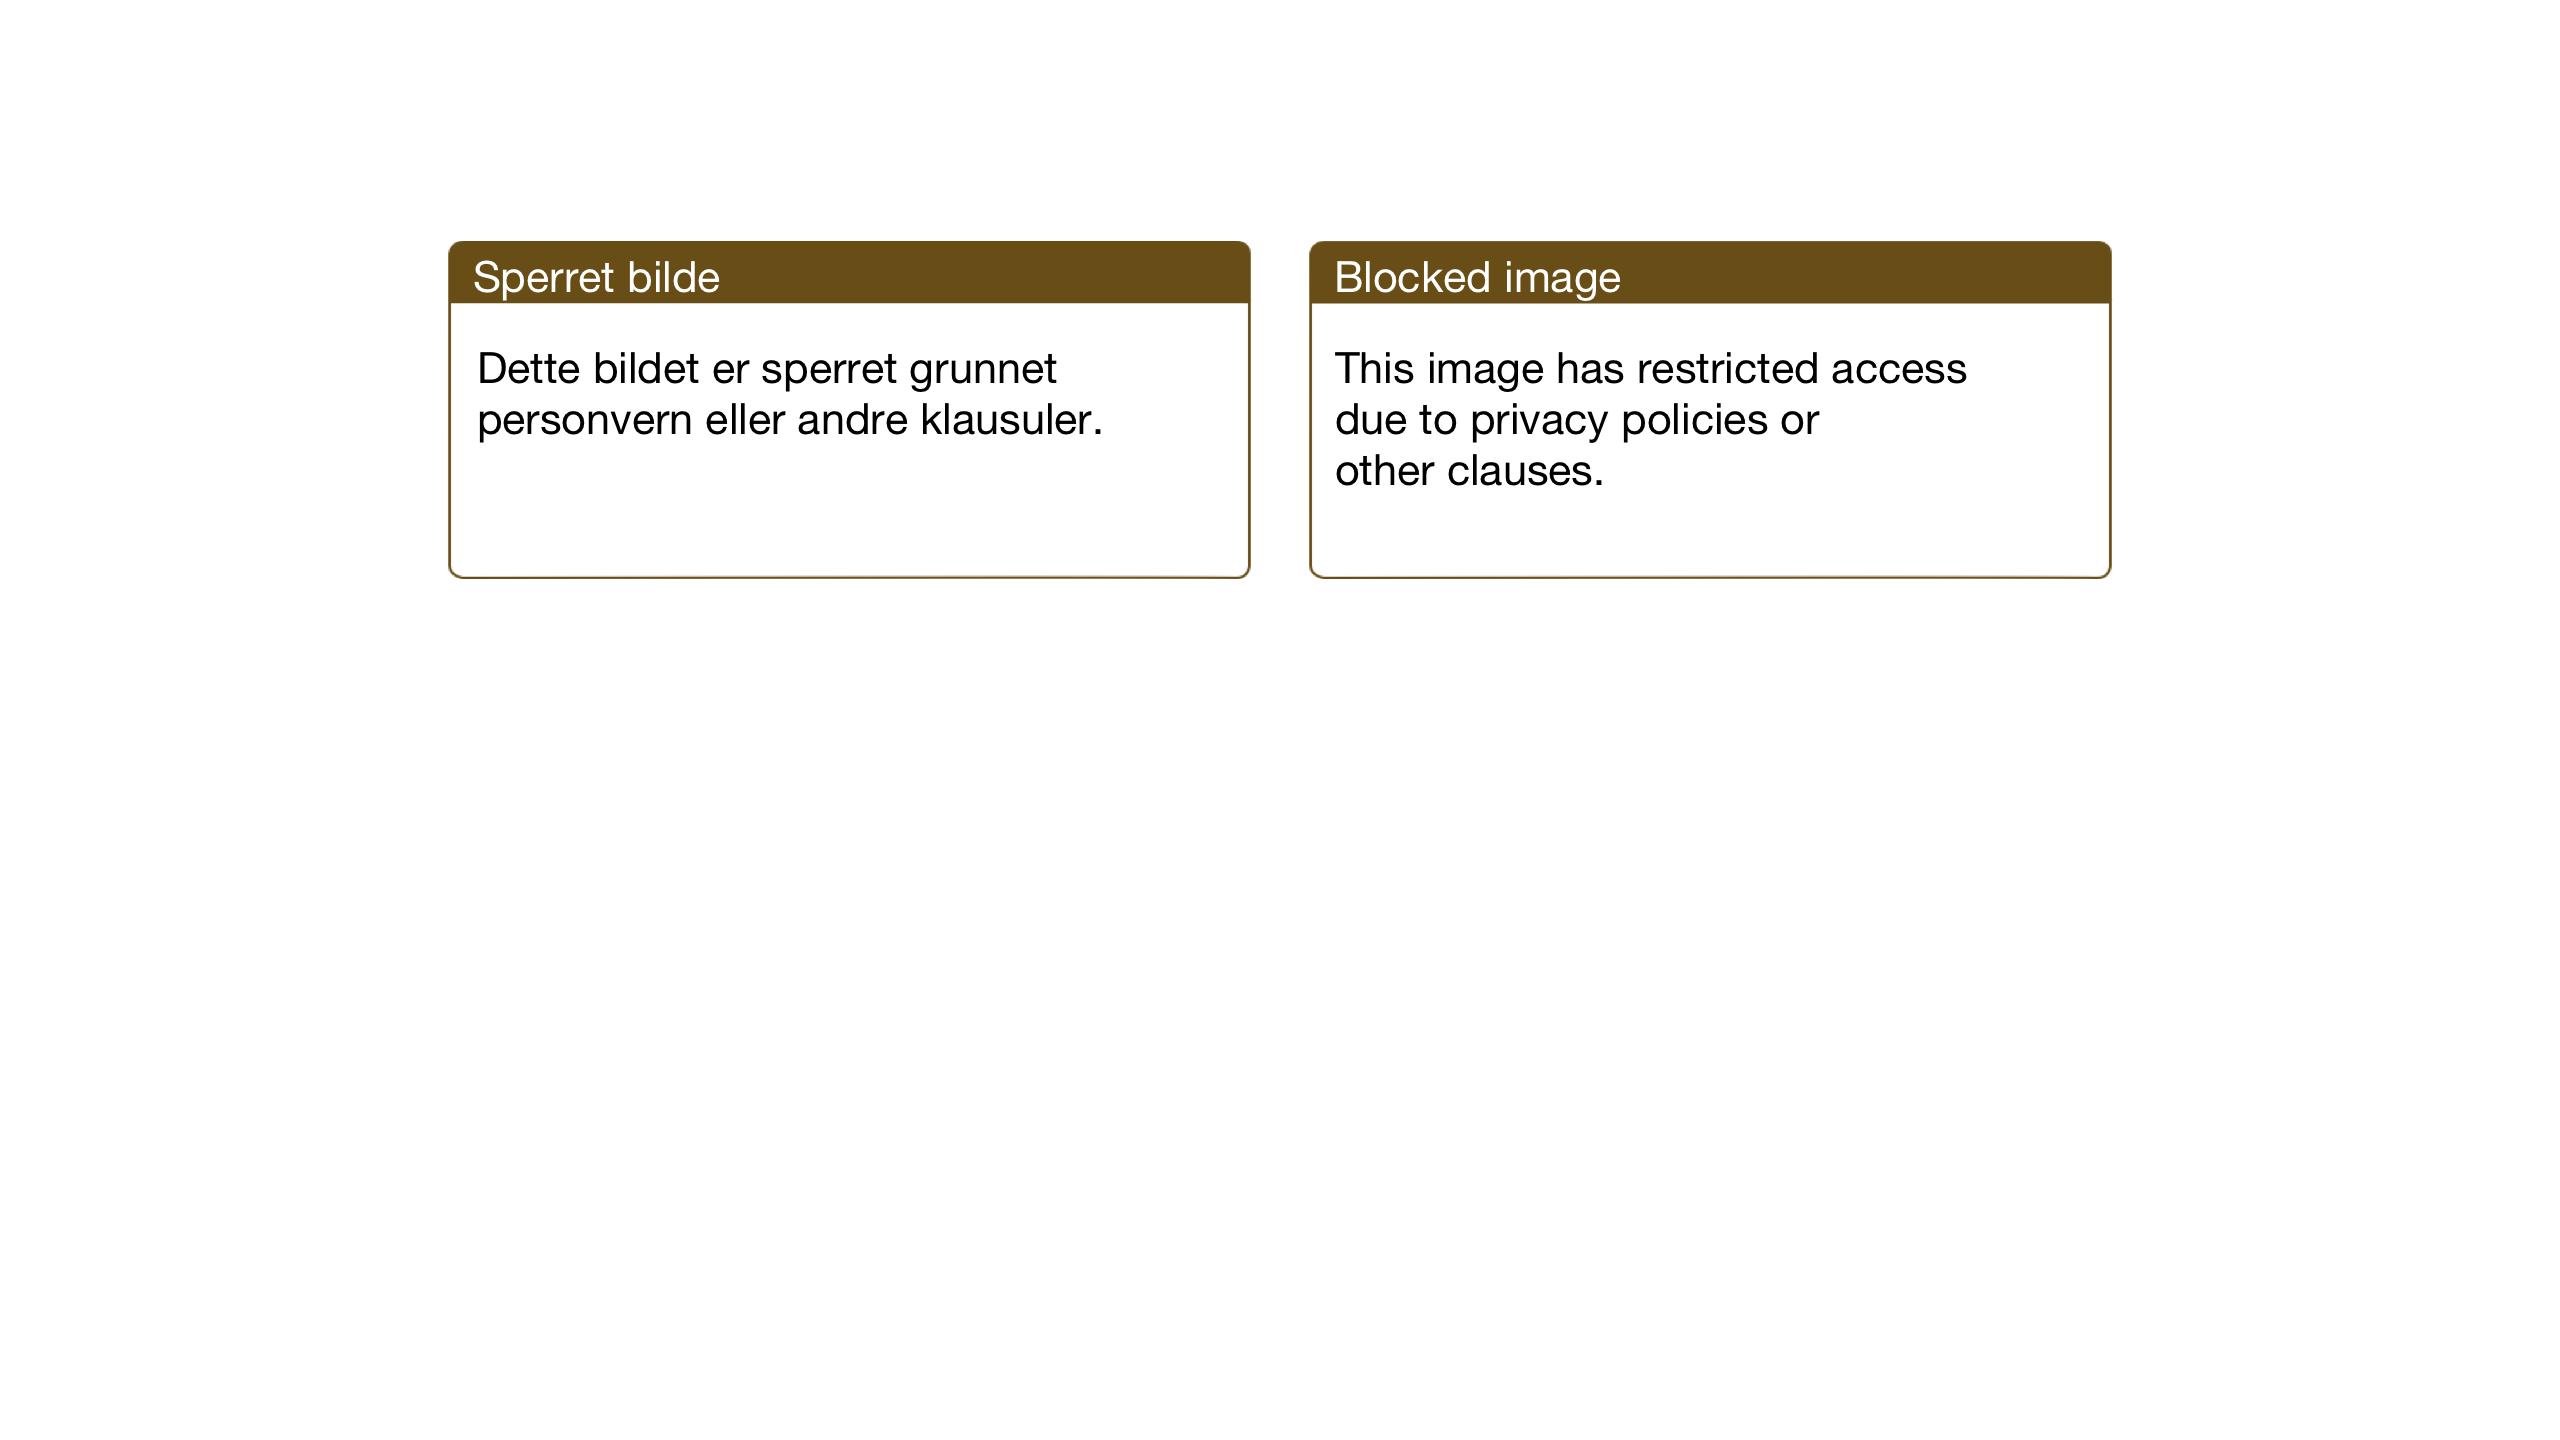 SAT, Ministerialprotokoller, klokkerbøker og fødselsregistre - Nordland, 847/L0680: Klokkerbok nr. 847C08, 1930-1947, s. 72